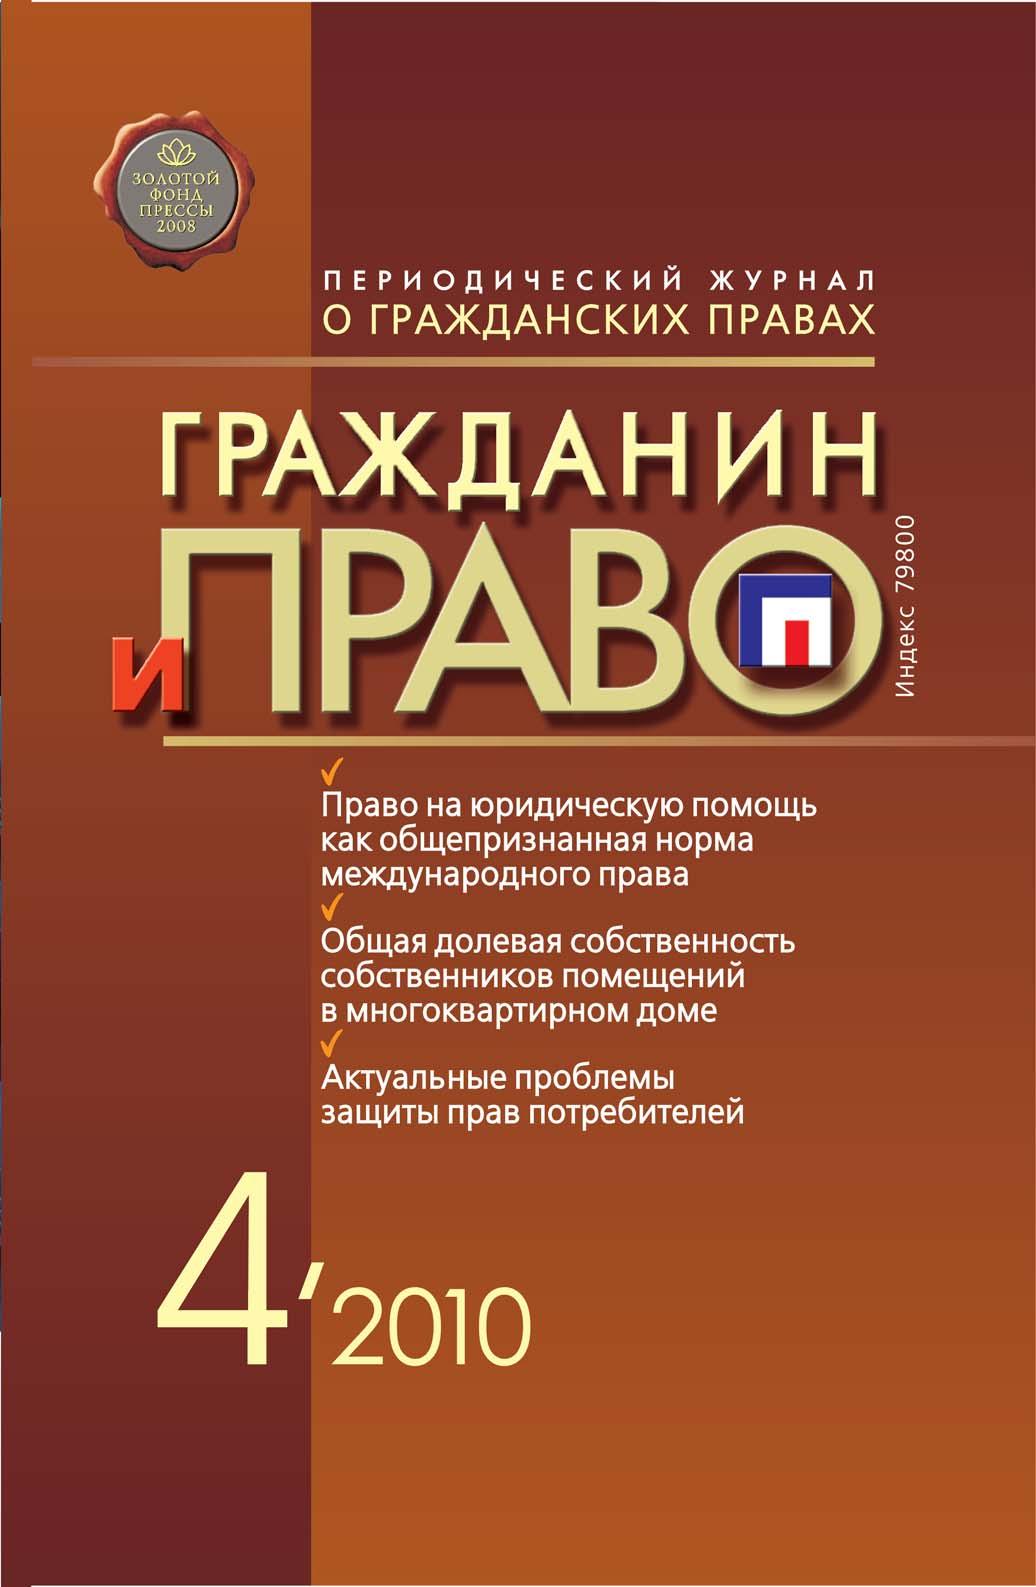 Гражданин и право №04/2010